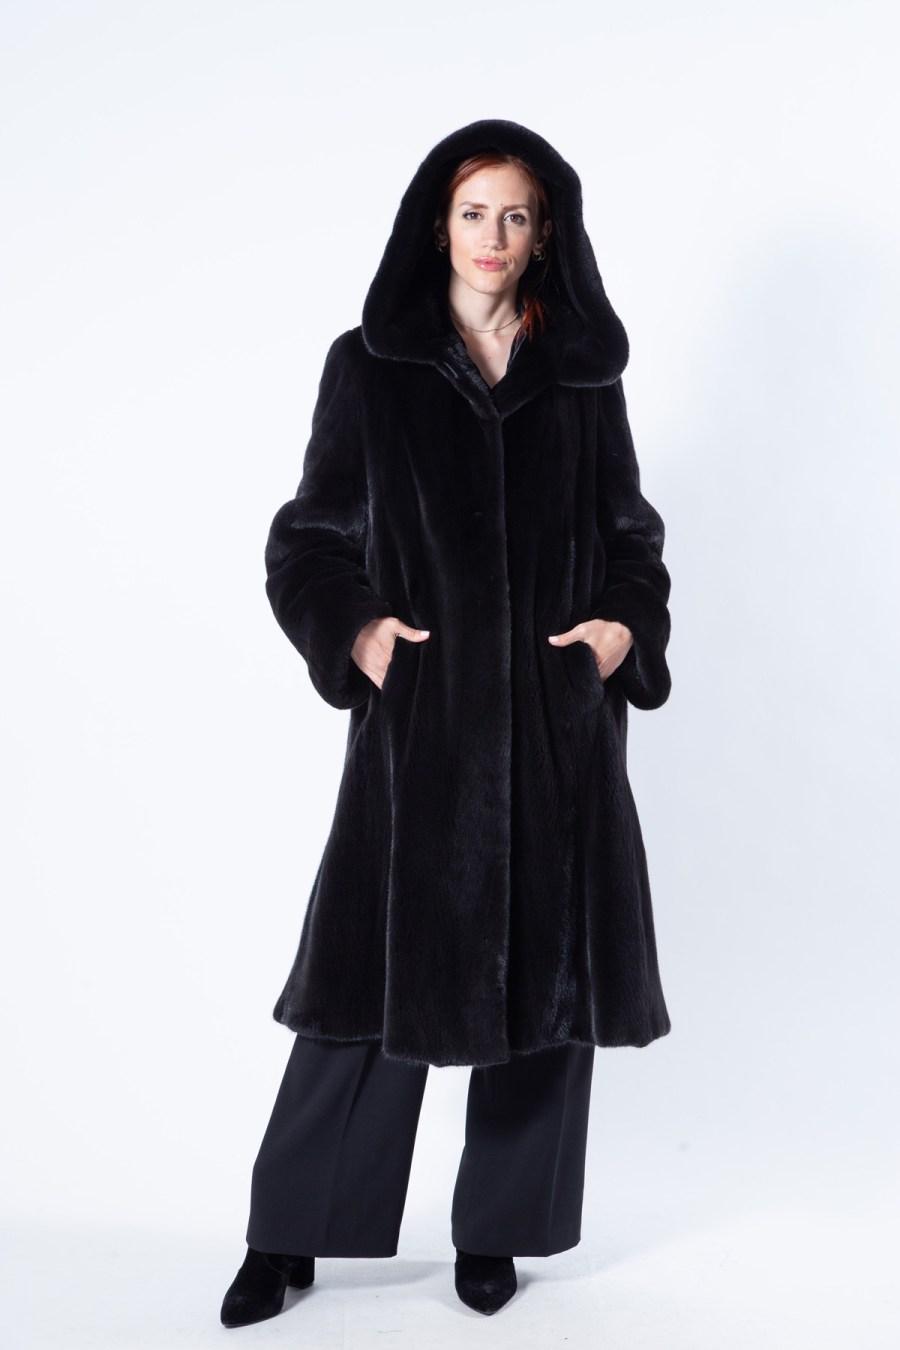 Blackglama Mink Coat with hood - Sarigianni Furs